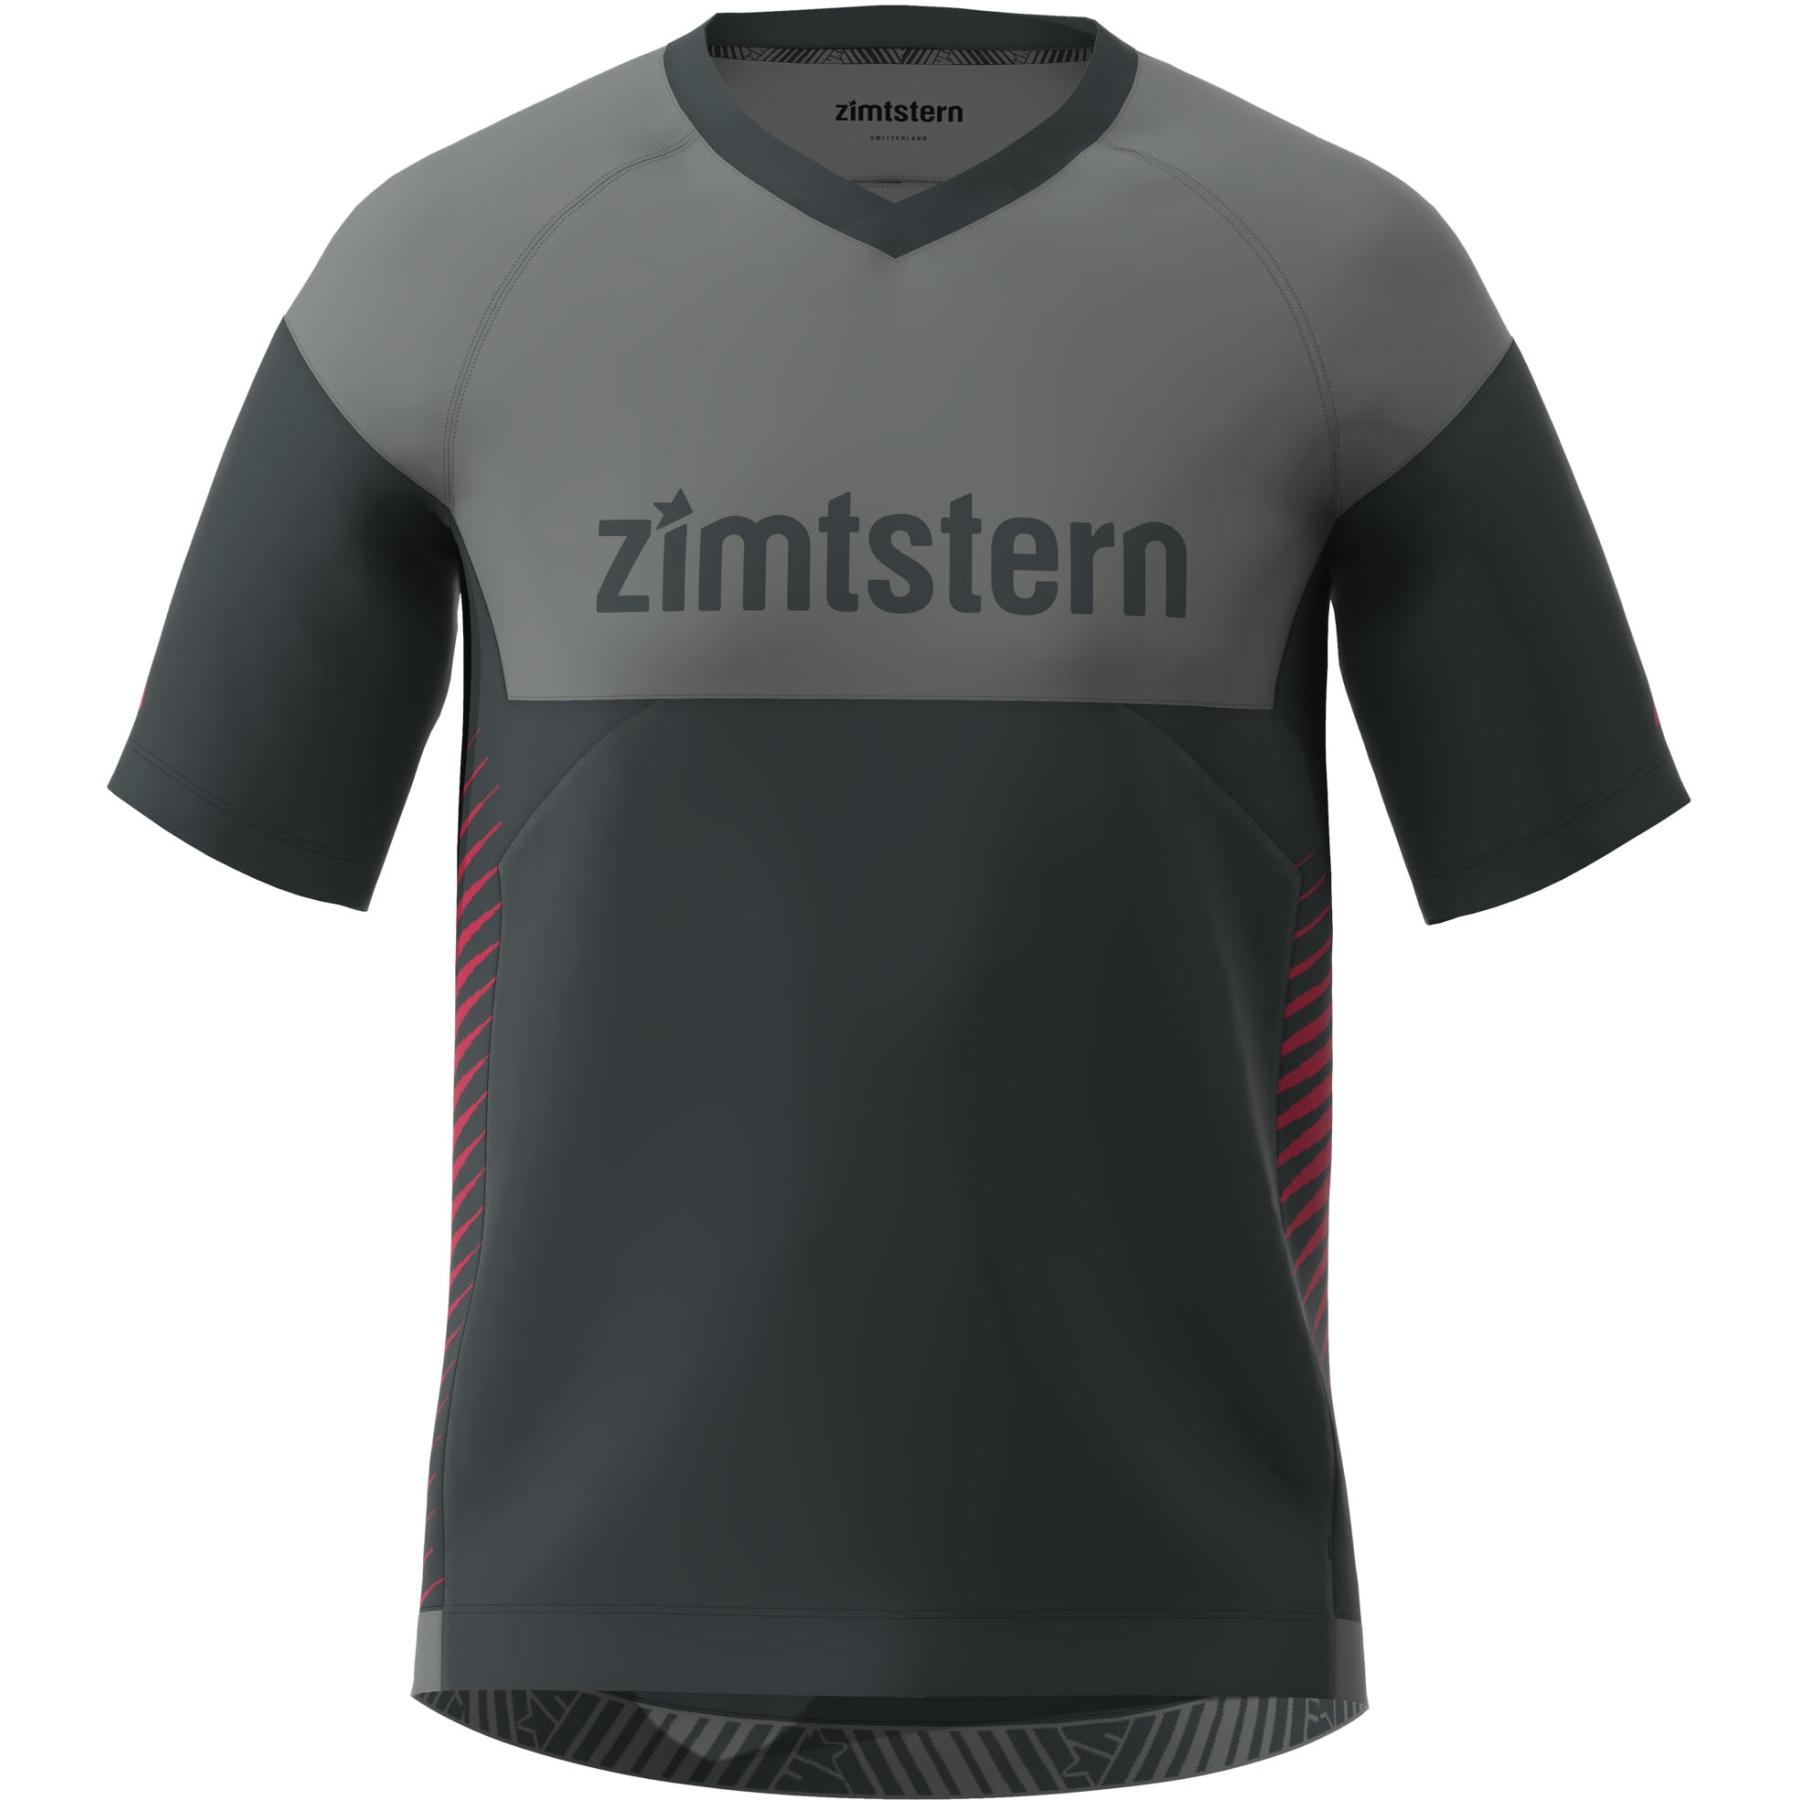 Zimtstern Bulletz Kurzarm-Shirt - pirate black/gun metal/jester red